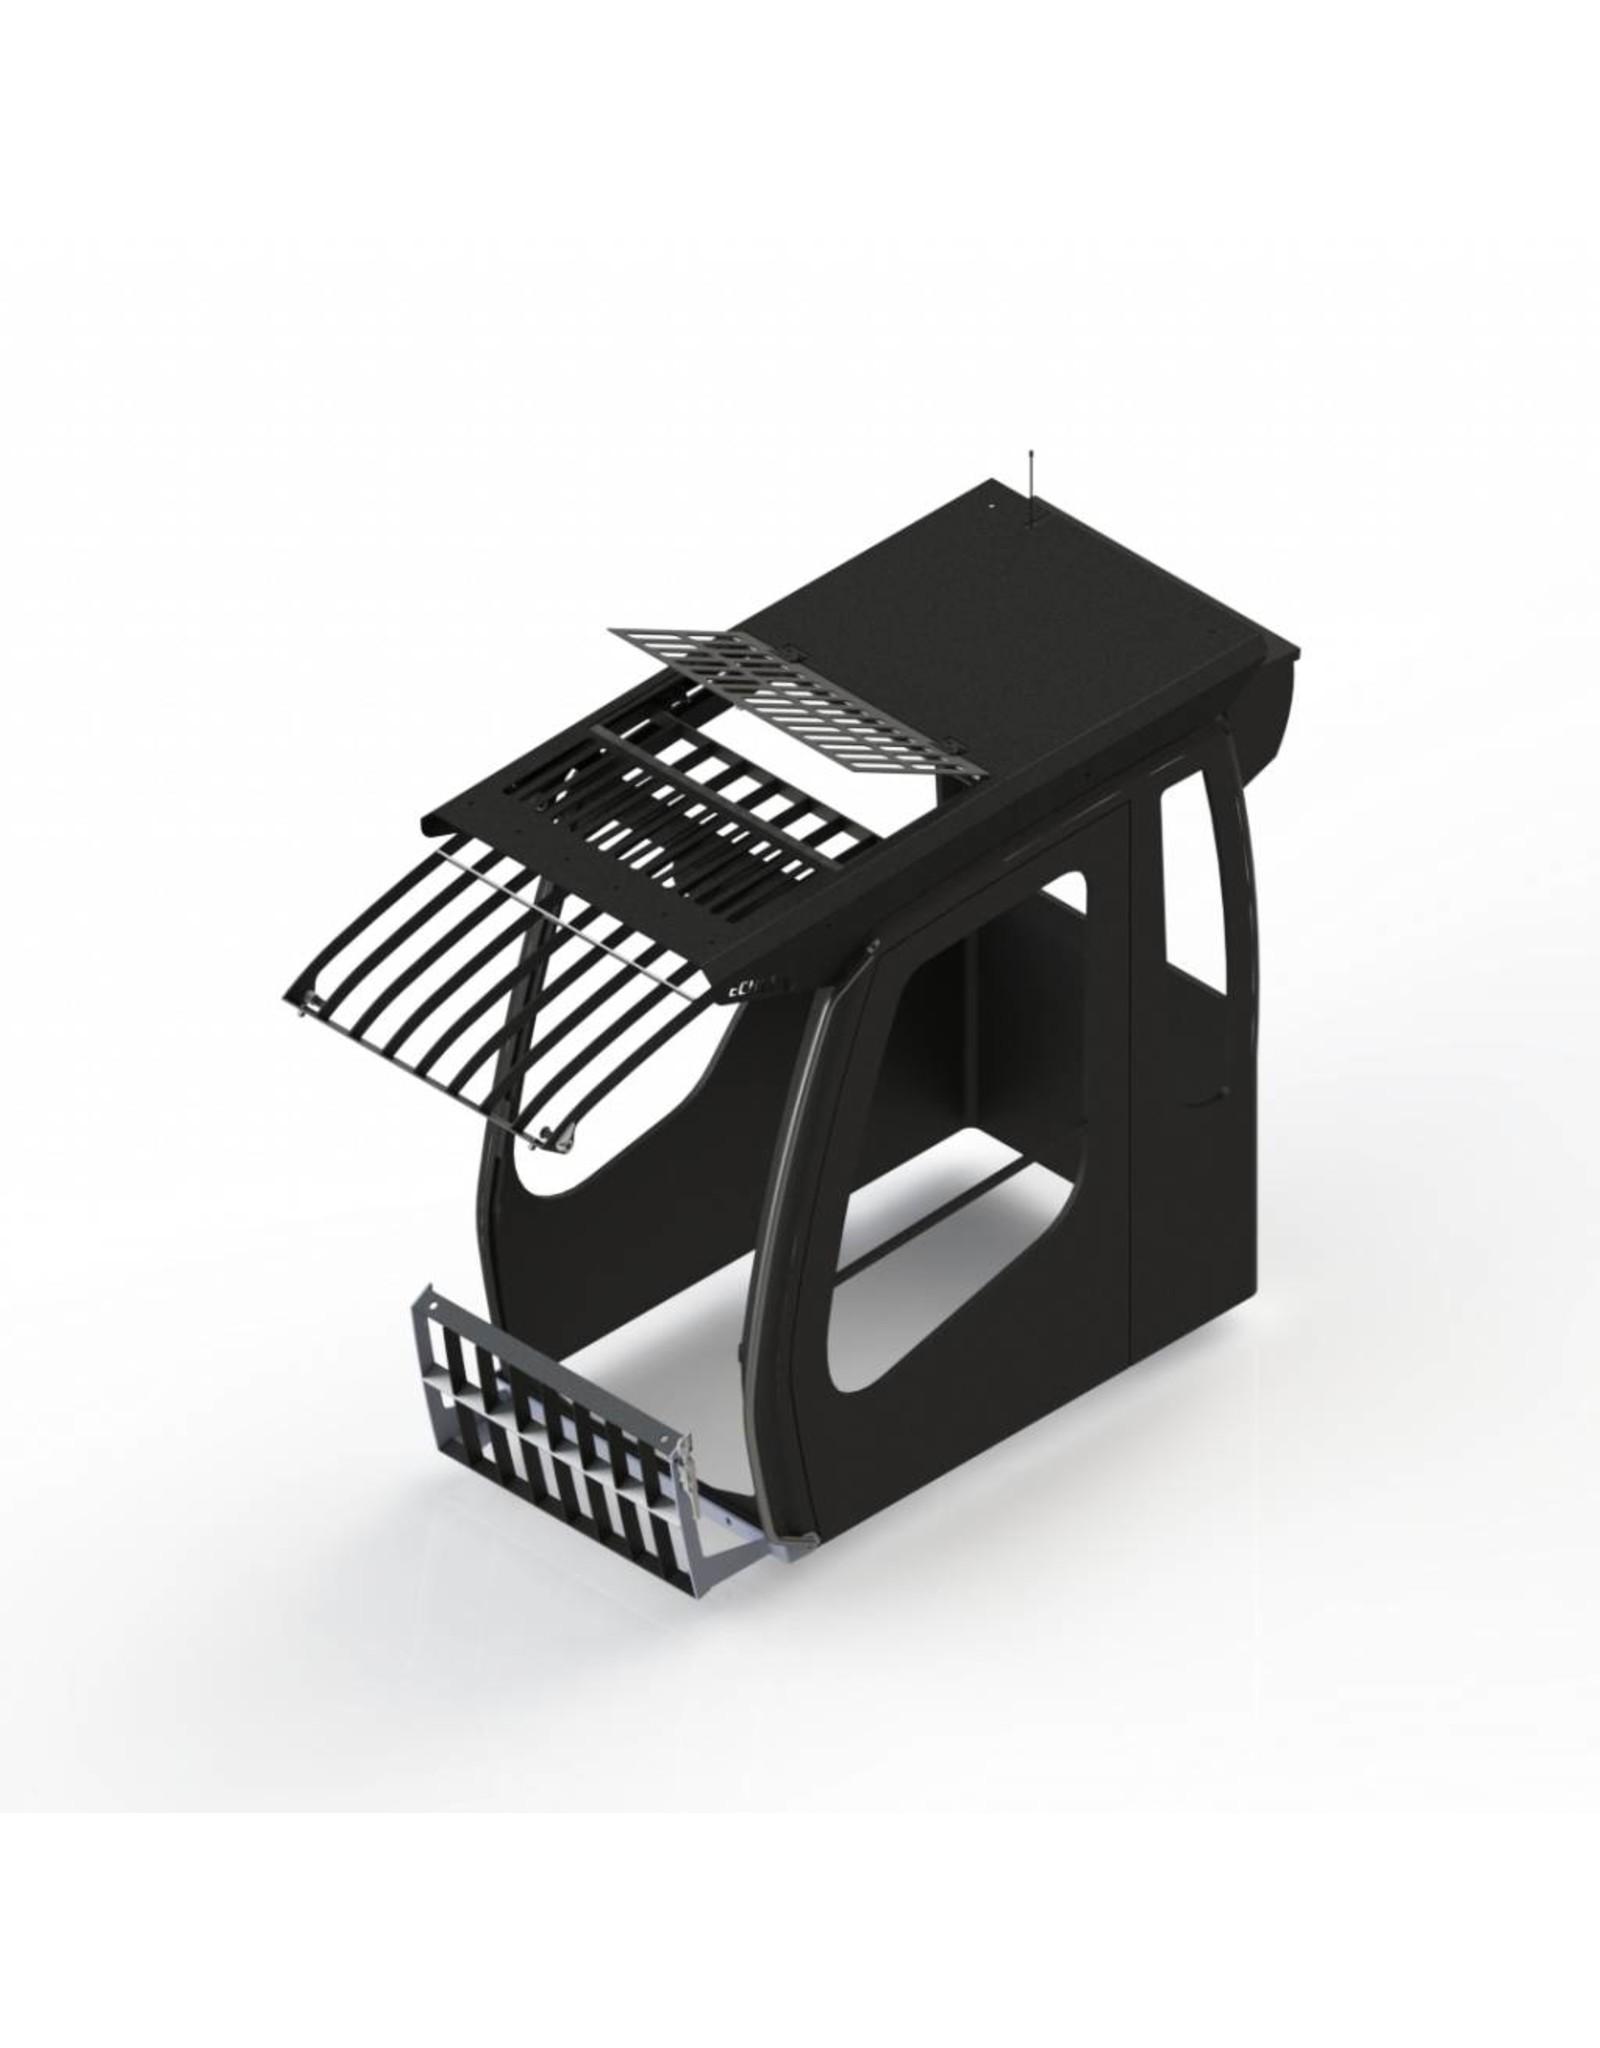 Echle Hartstahl GmbH FOPS for Liebherr R 980 SME